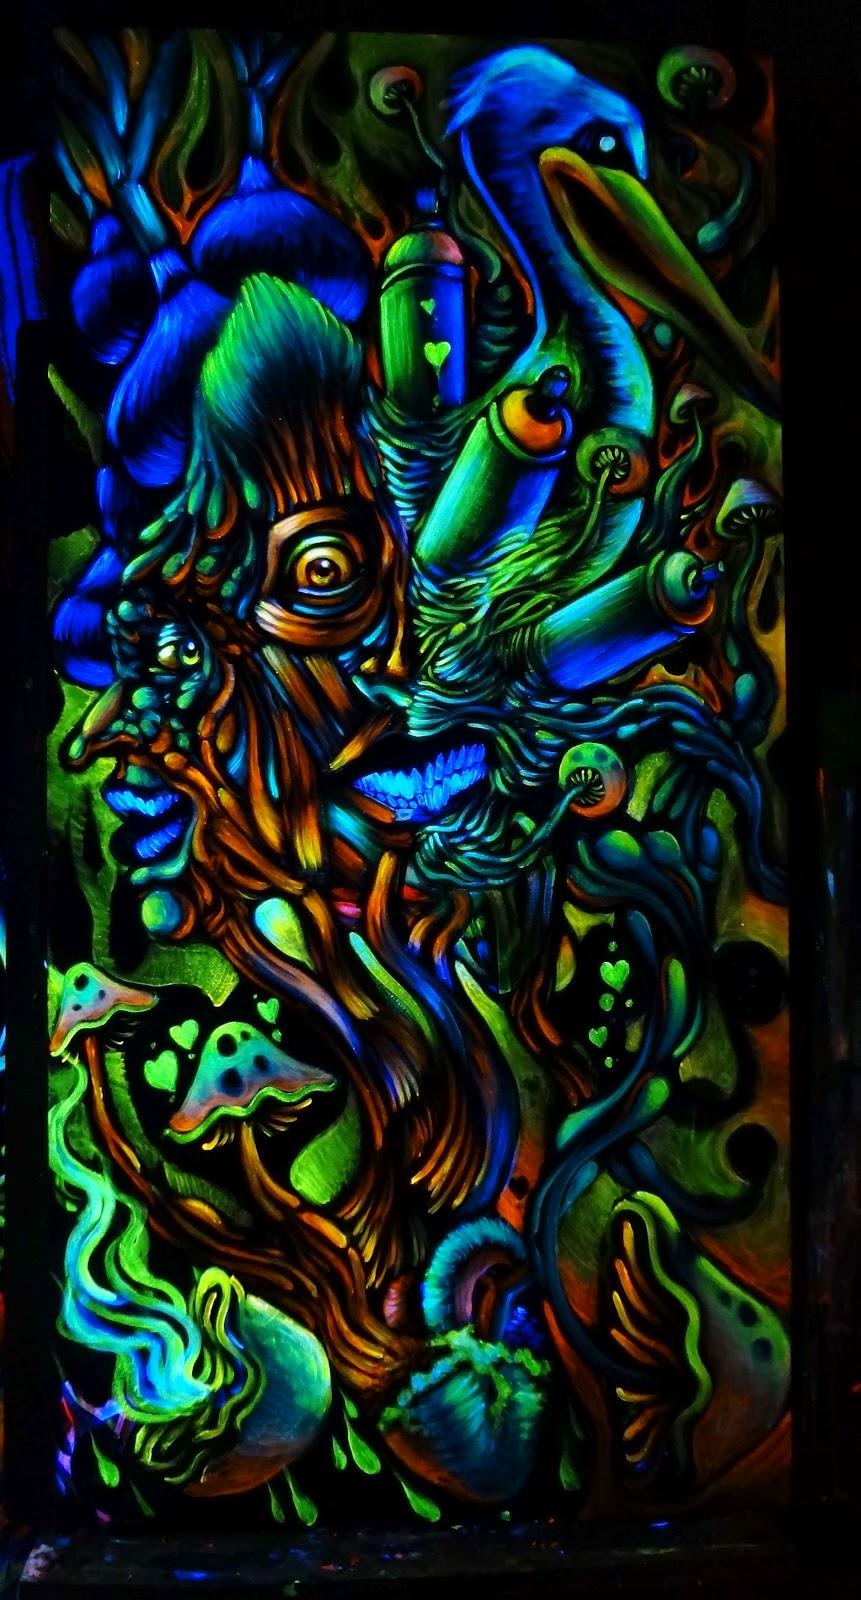 THE BLACK LIGHT KING: Eat mushrooms turn paint into gold.....